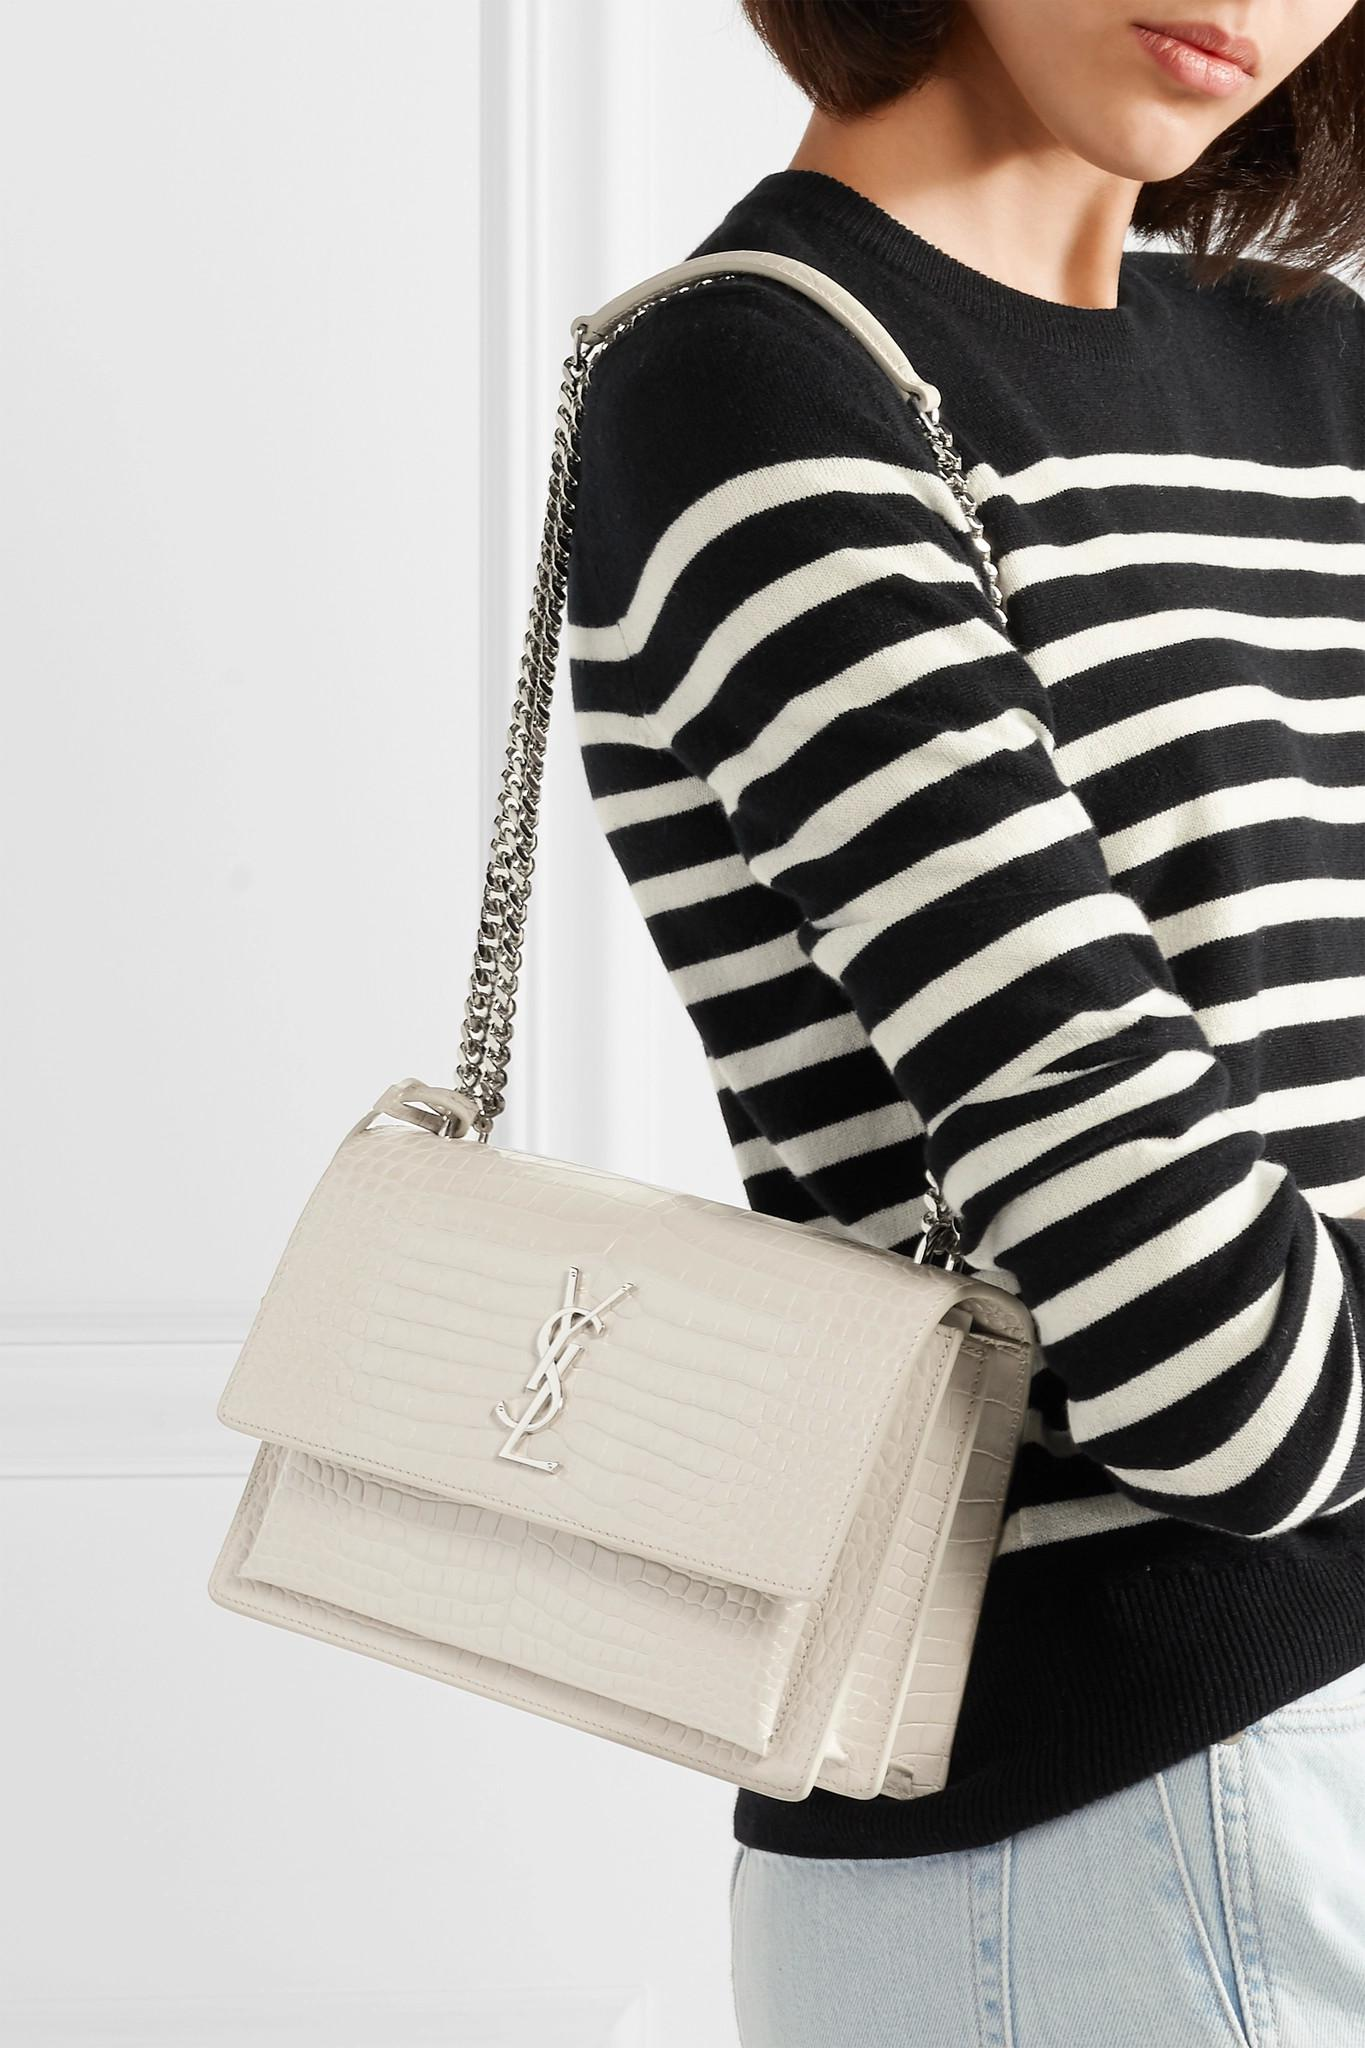 2daf1ad44103 Lyst - Saint Laurent Sunset Medium Croc-effect Leather Shoulder Bag ...